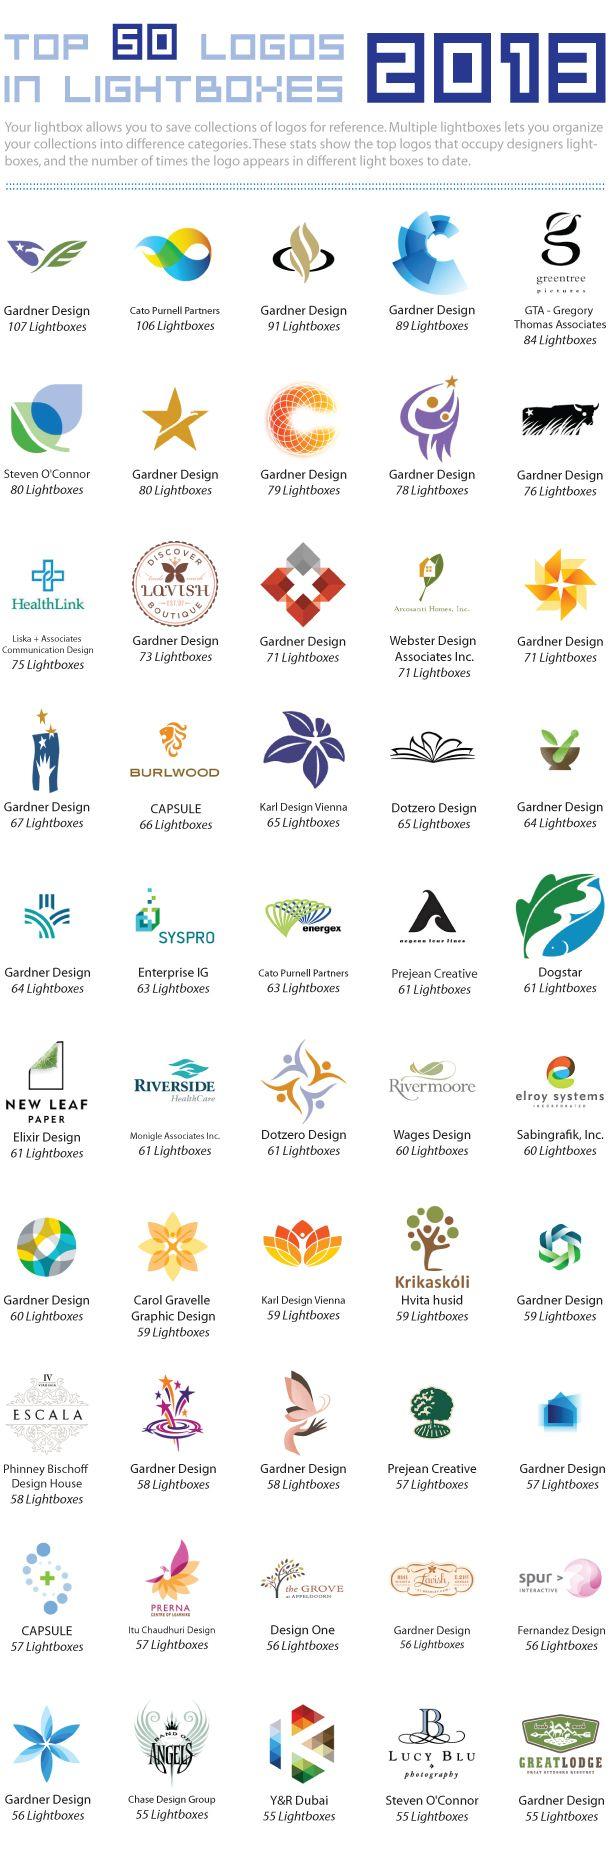 LogoLounge's 2013 Logo design trends & styles